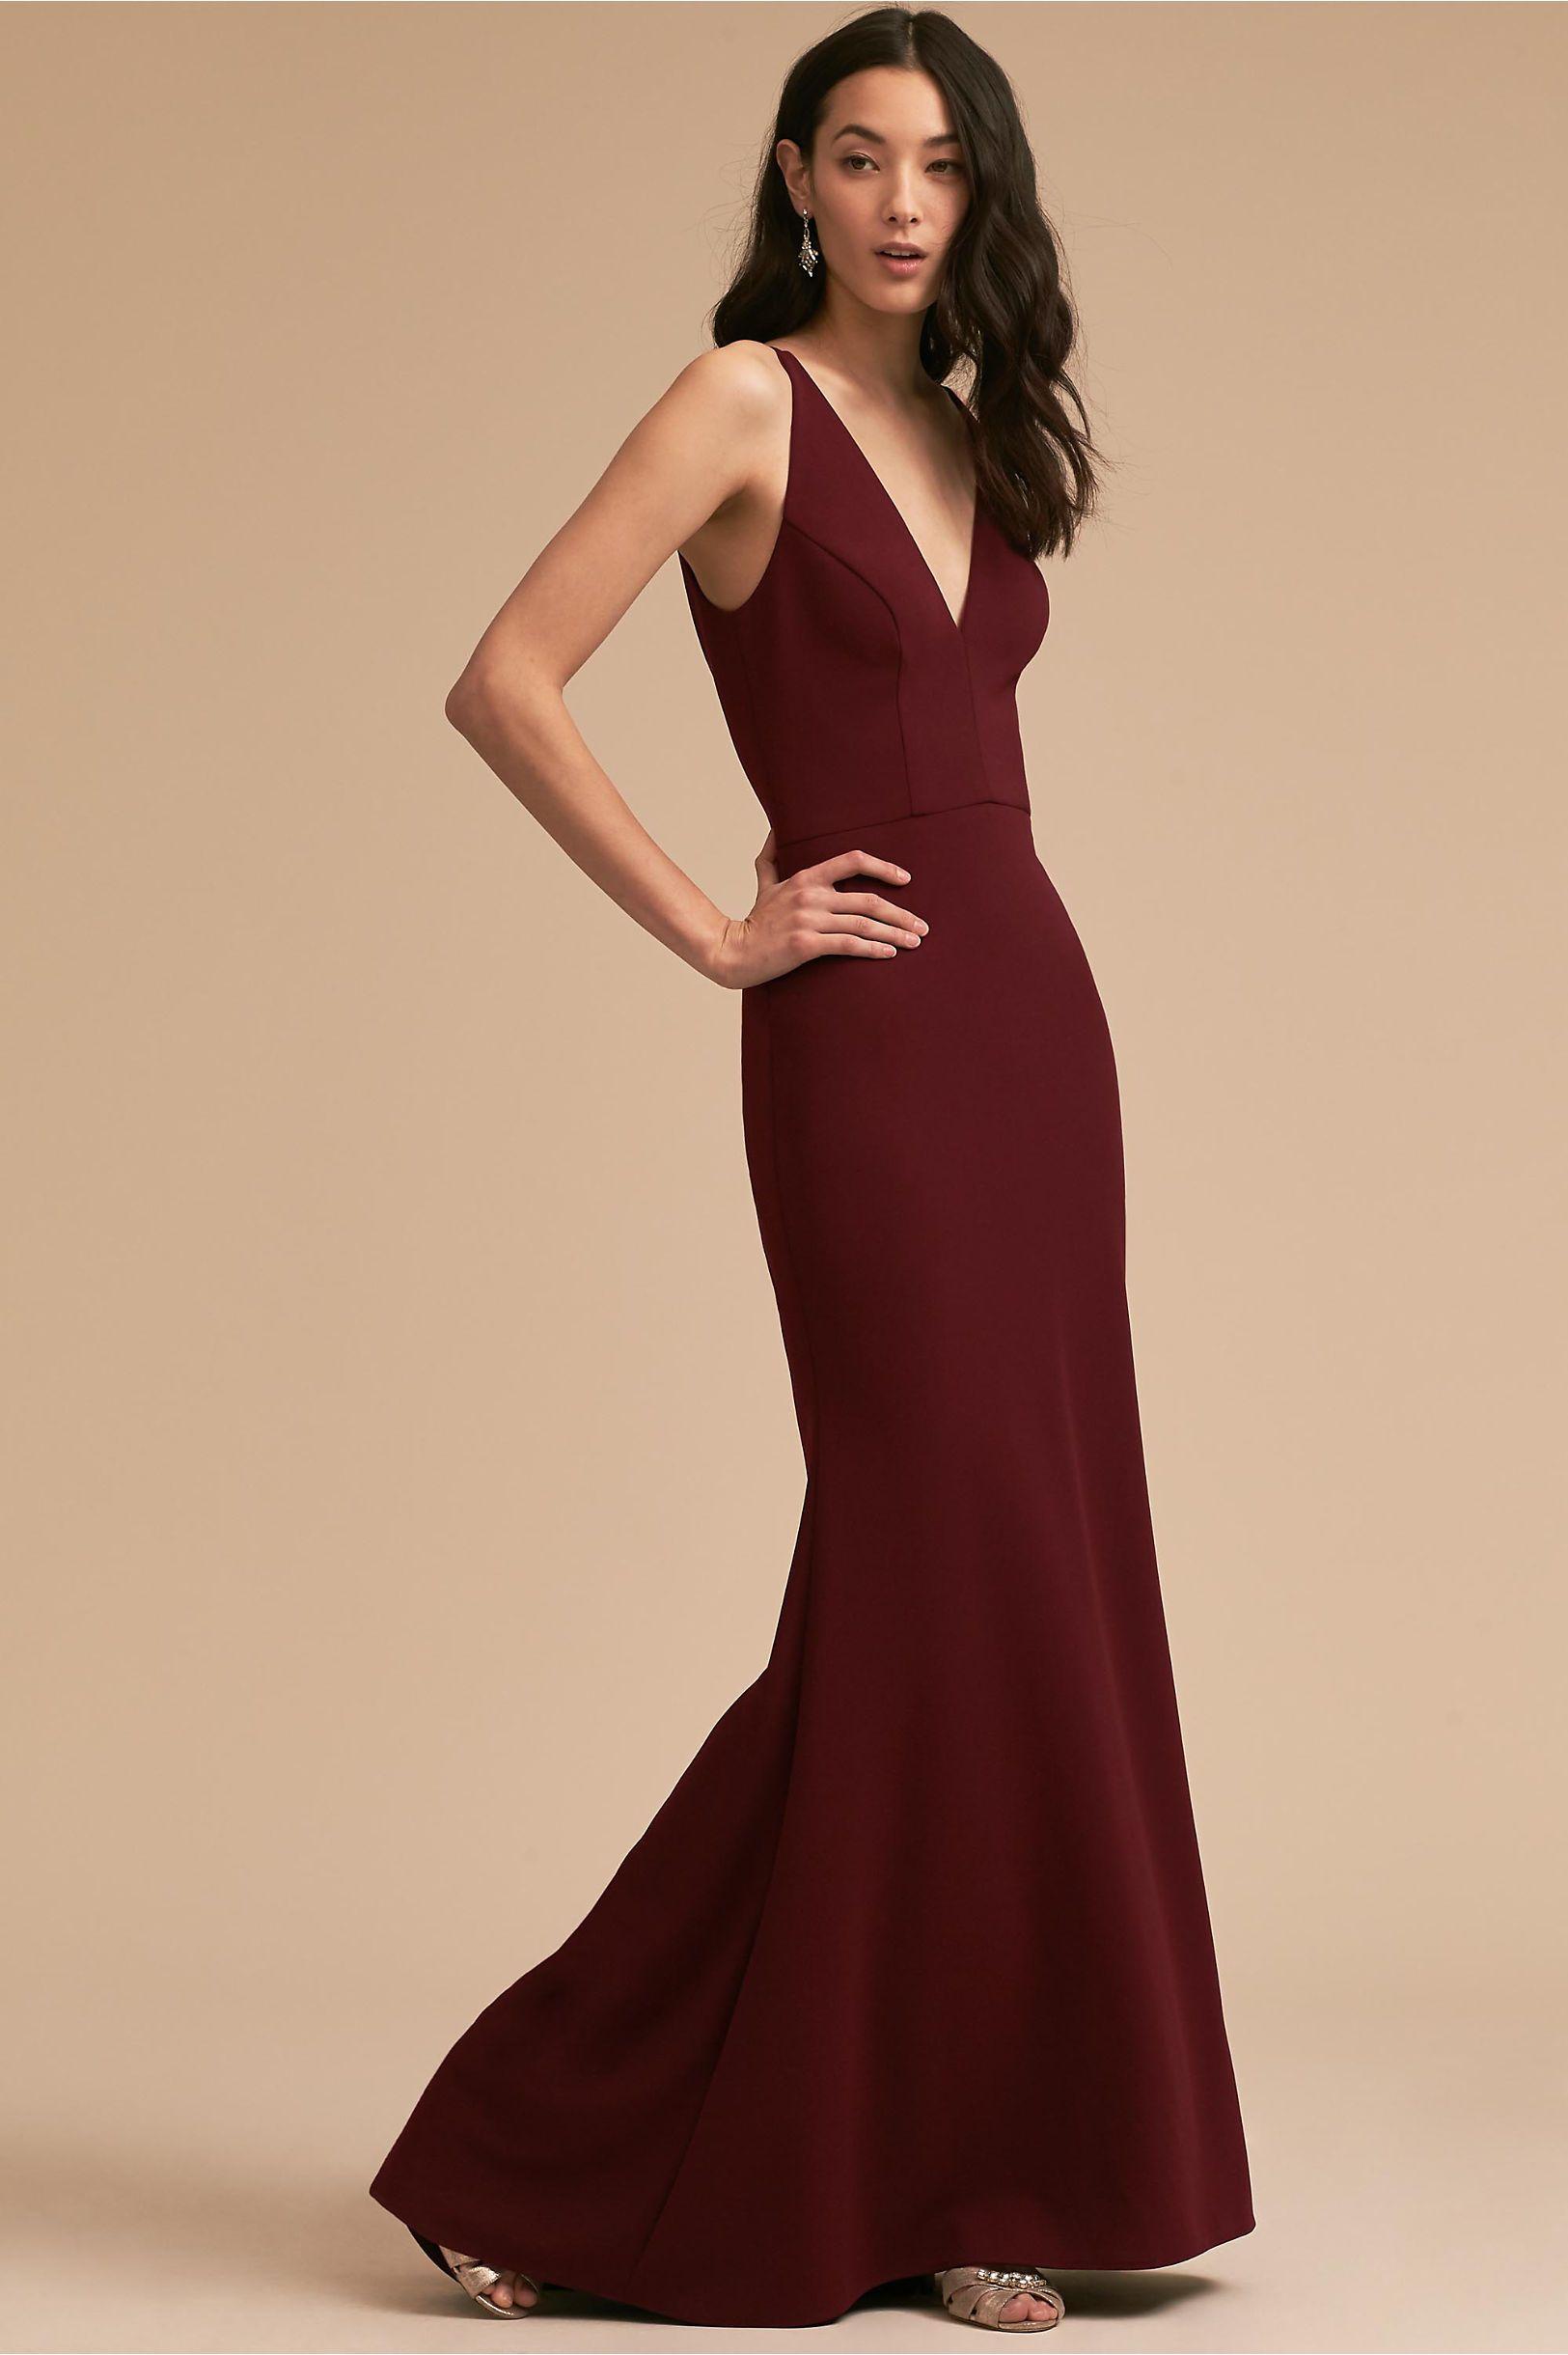 8e689557710 Dark Burgundy Bridesmaid Dresses - Data Dynamic AG